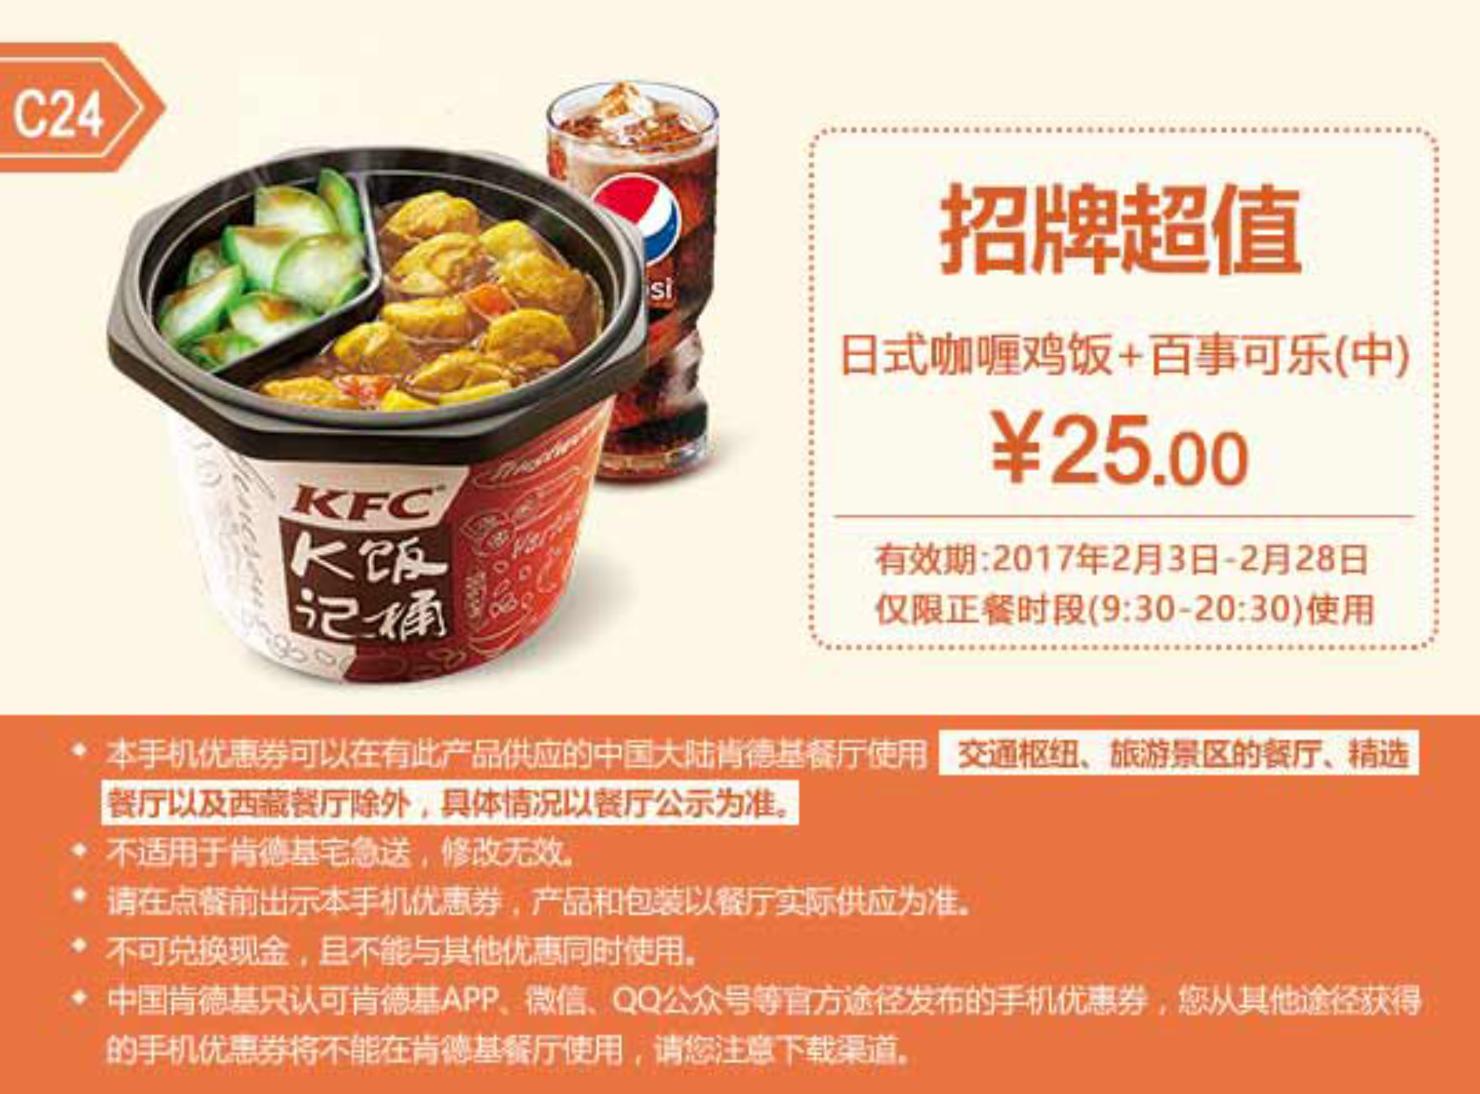 C24日式咖喱鸡饭+百事可乐(中)